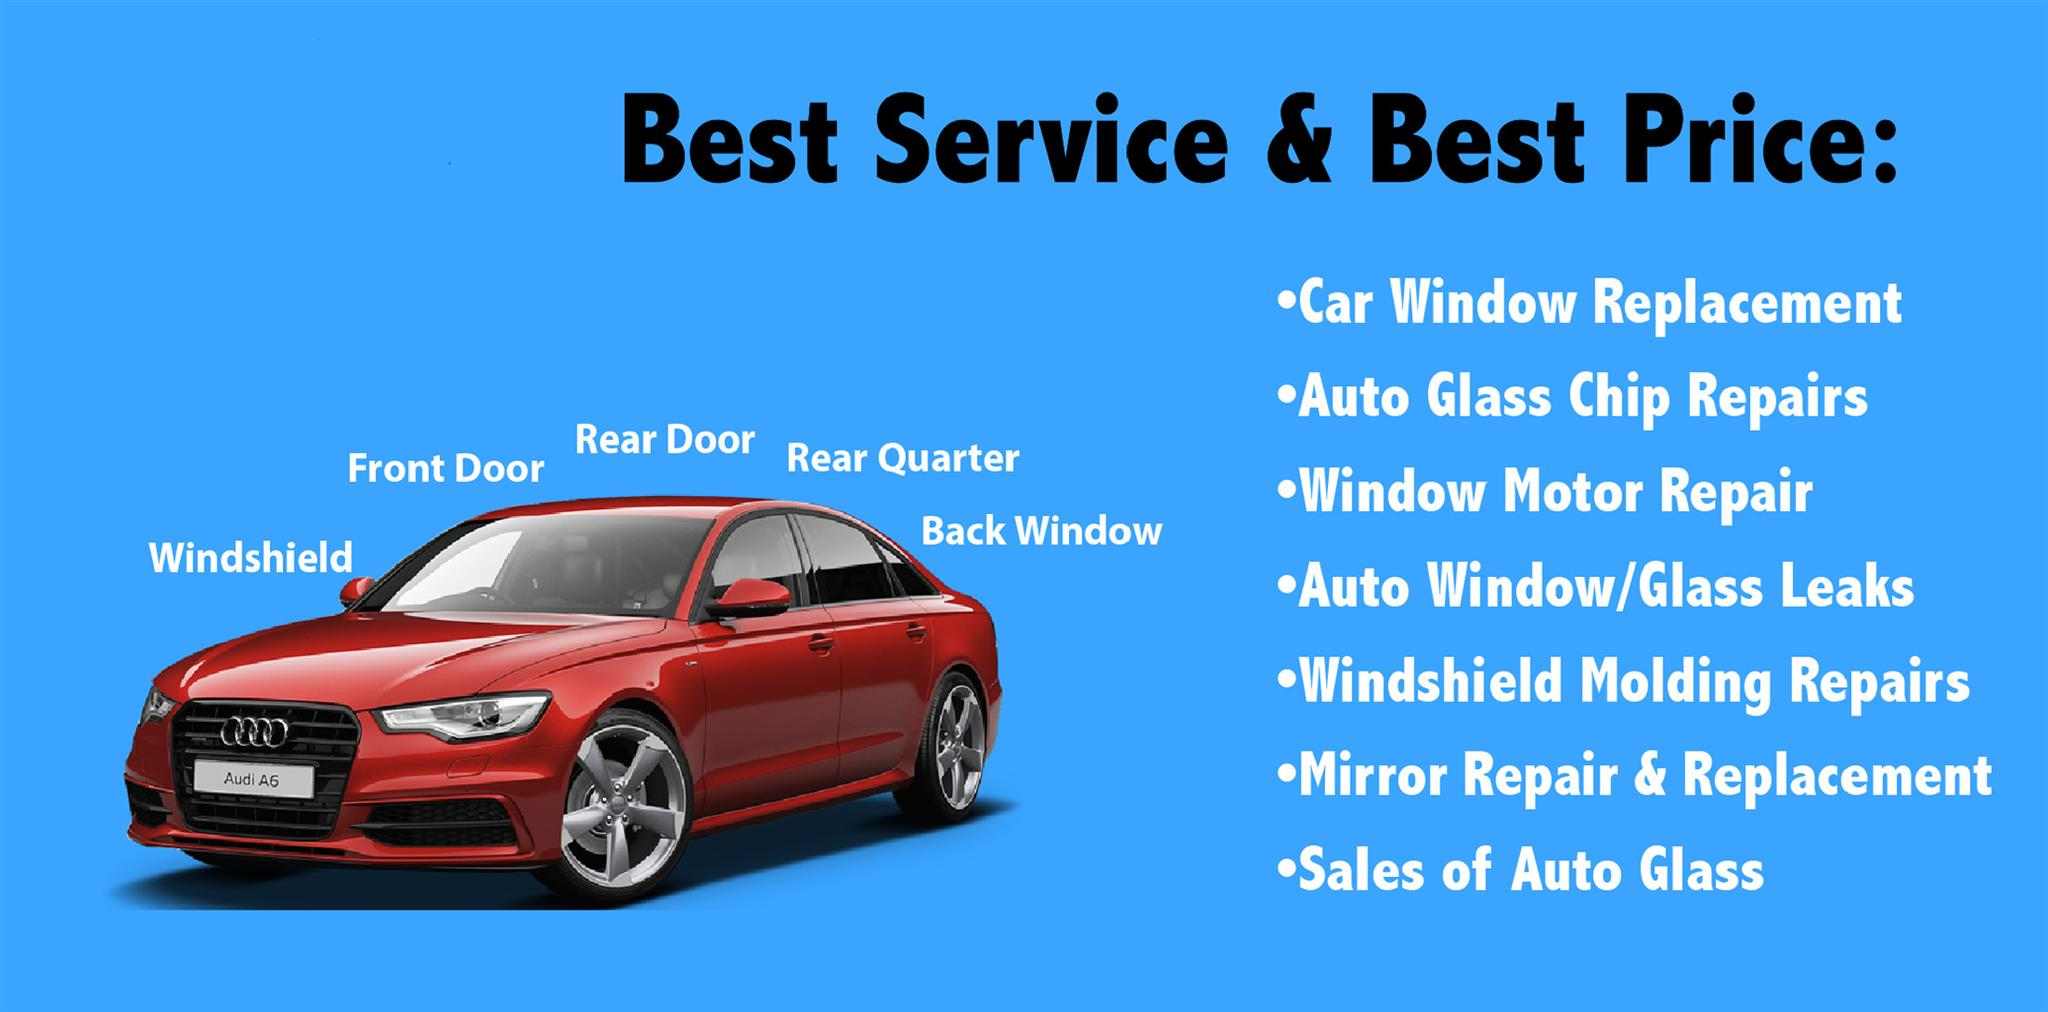 Auto Window Repair Near Me >> Auto Glass Car Glass Repair Windshield Repair Windshield